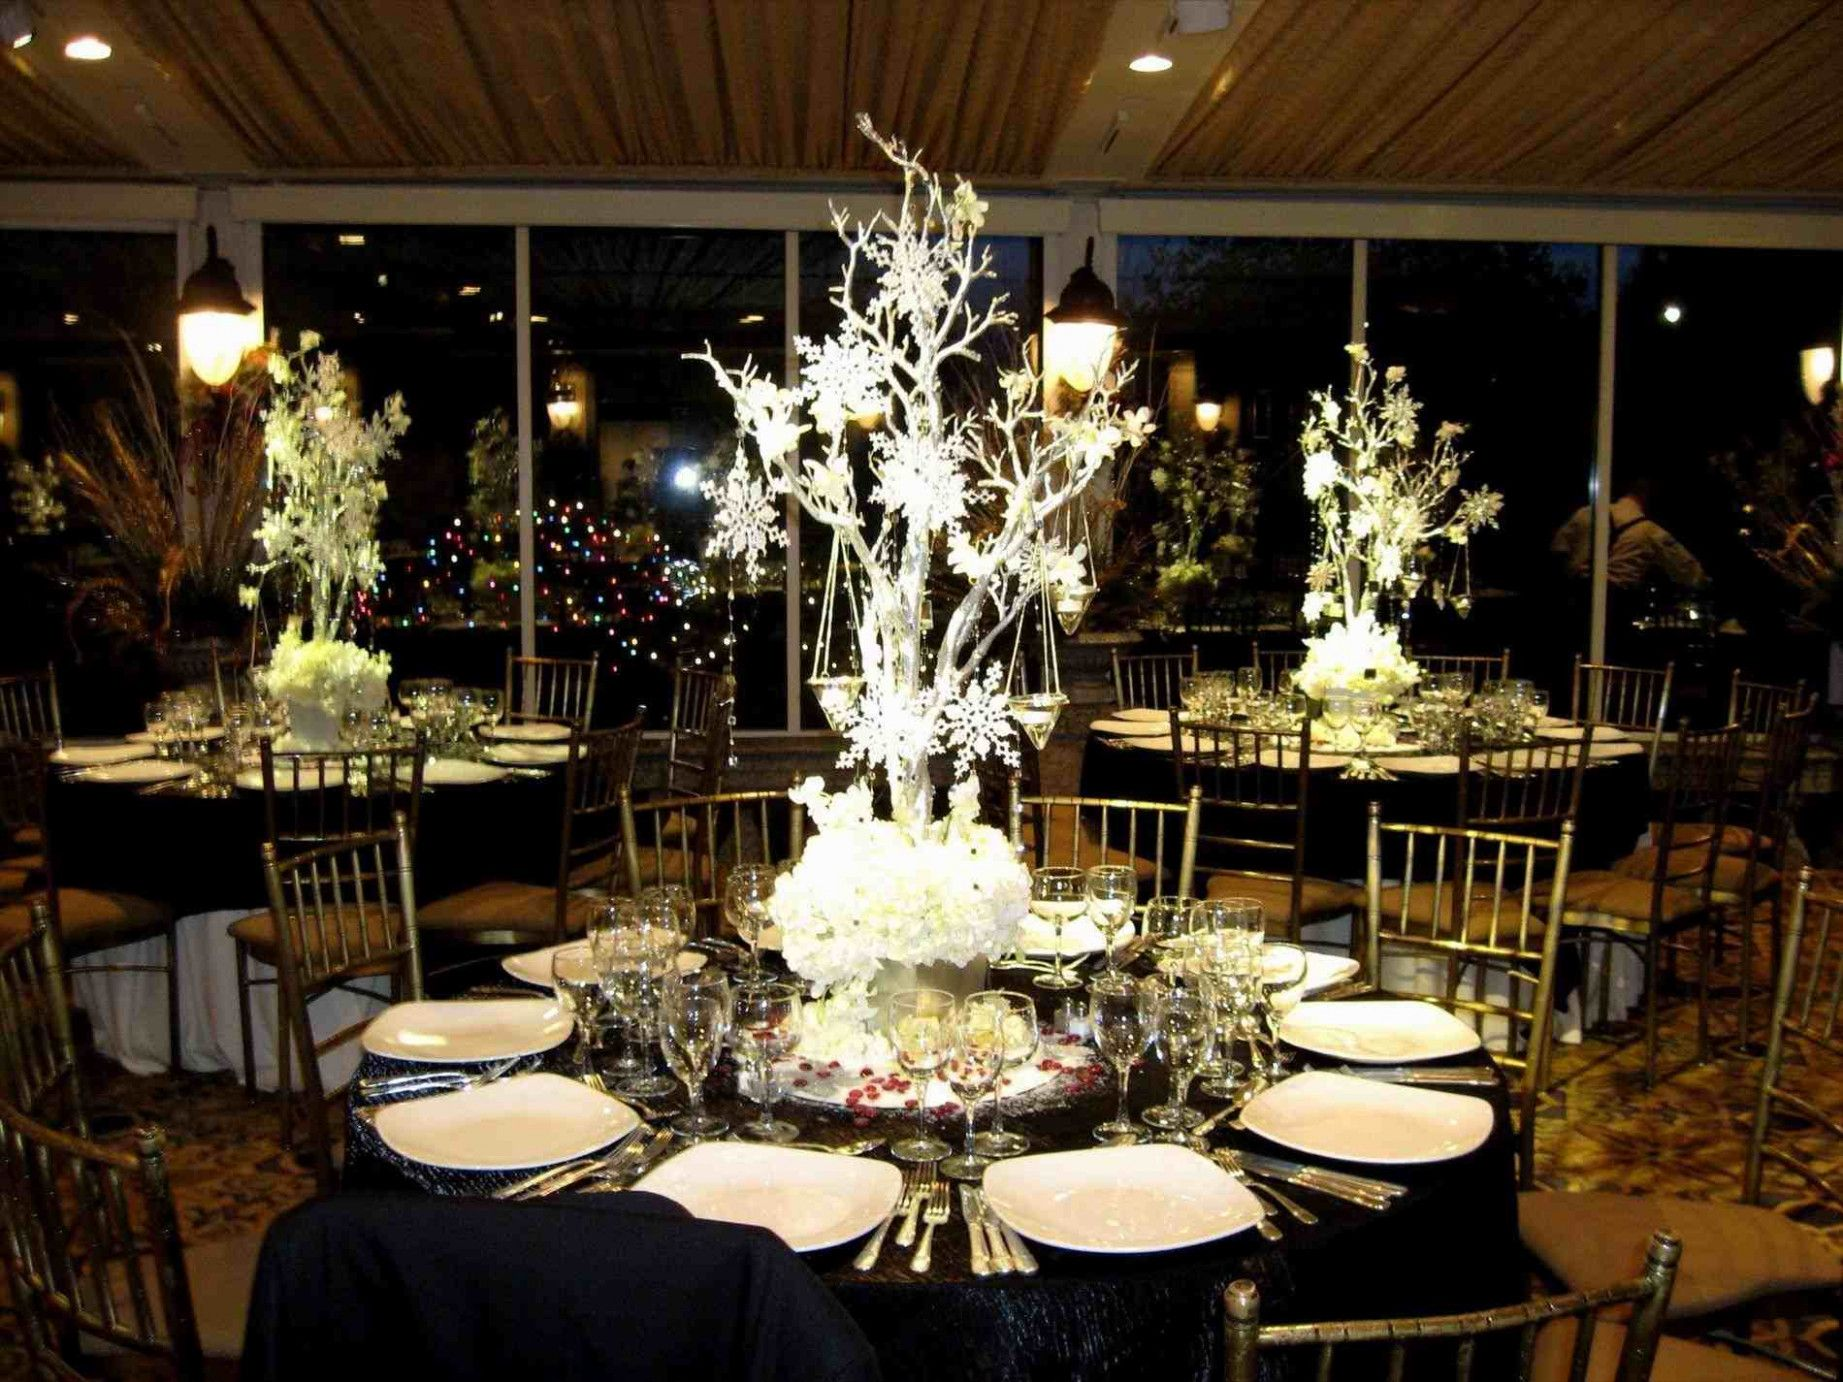 Wedding Table Ideas On A Budget Decoration Siudy 2 Smartvaforu